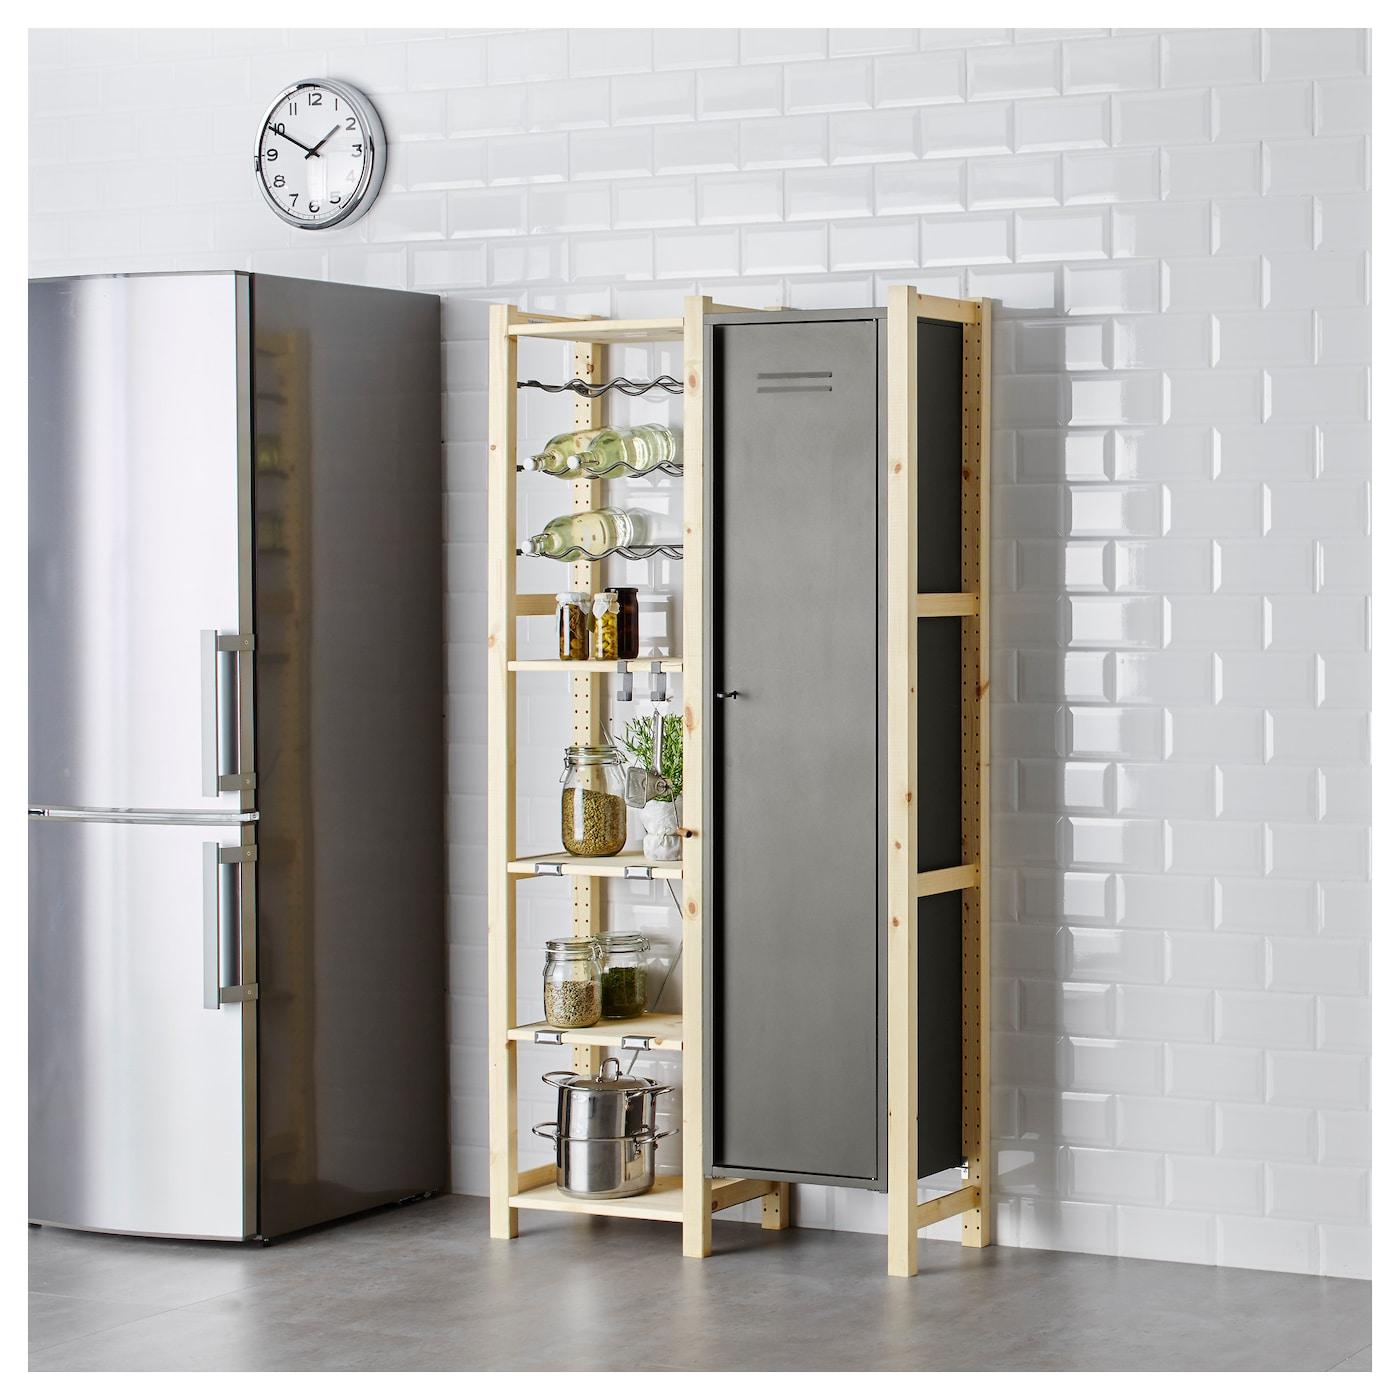 Schränke Ikea ivar schrank mit türen 80x83 cm ikea